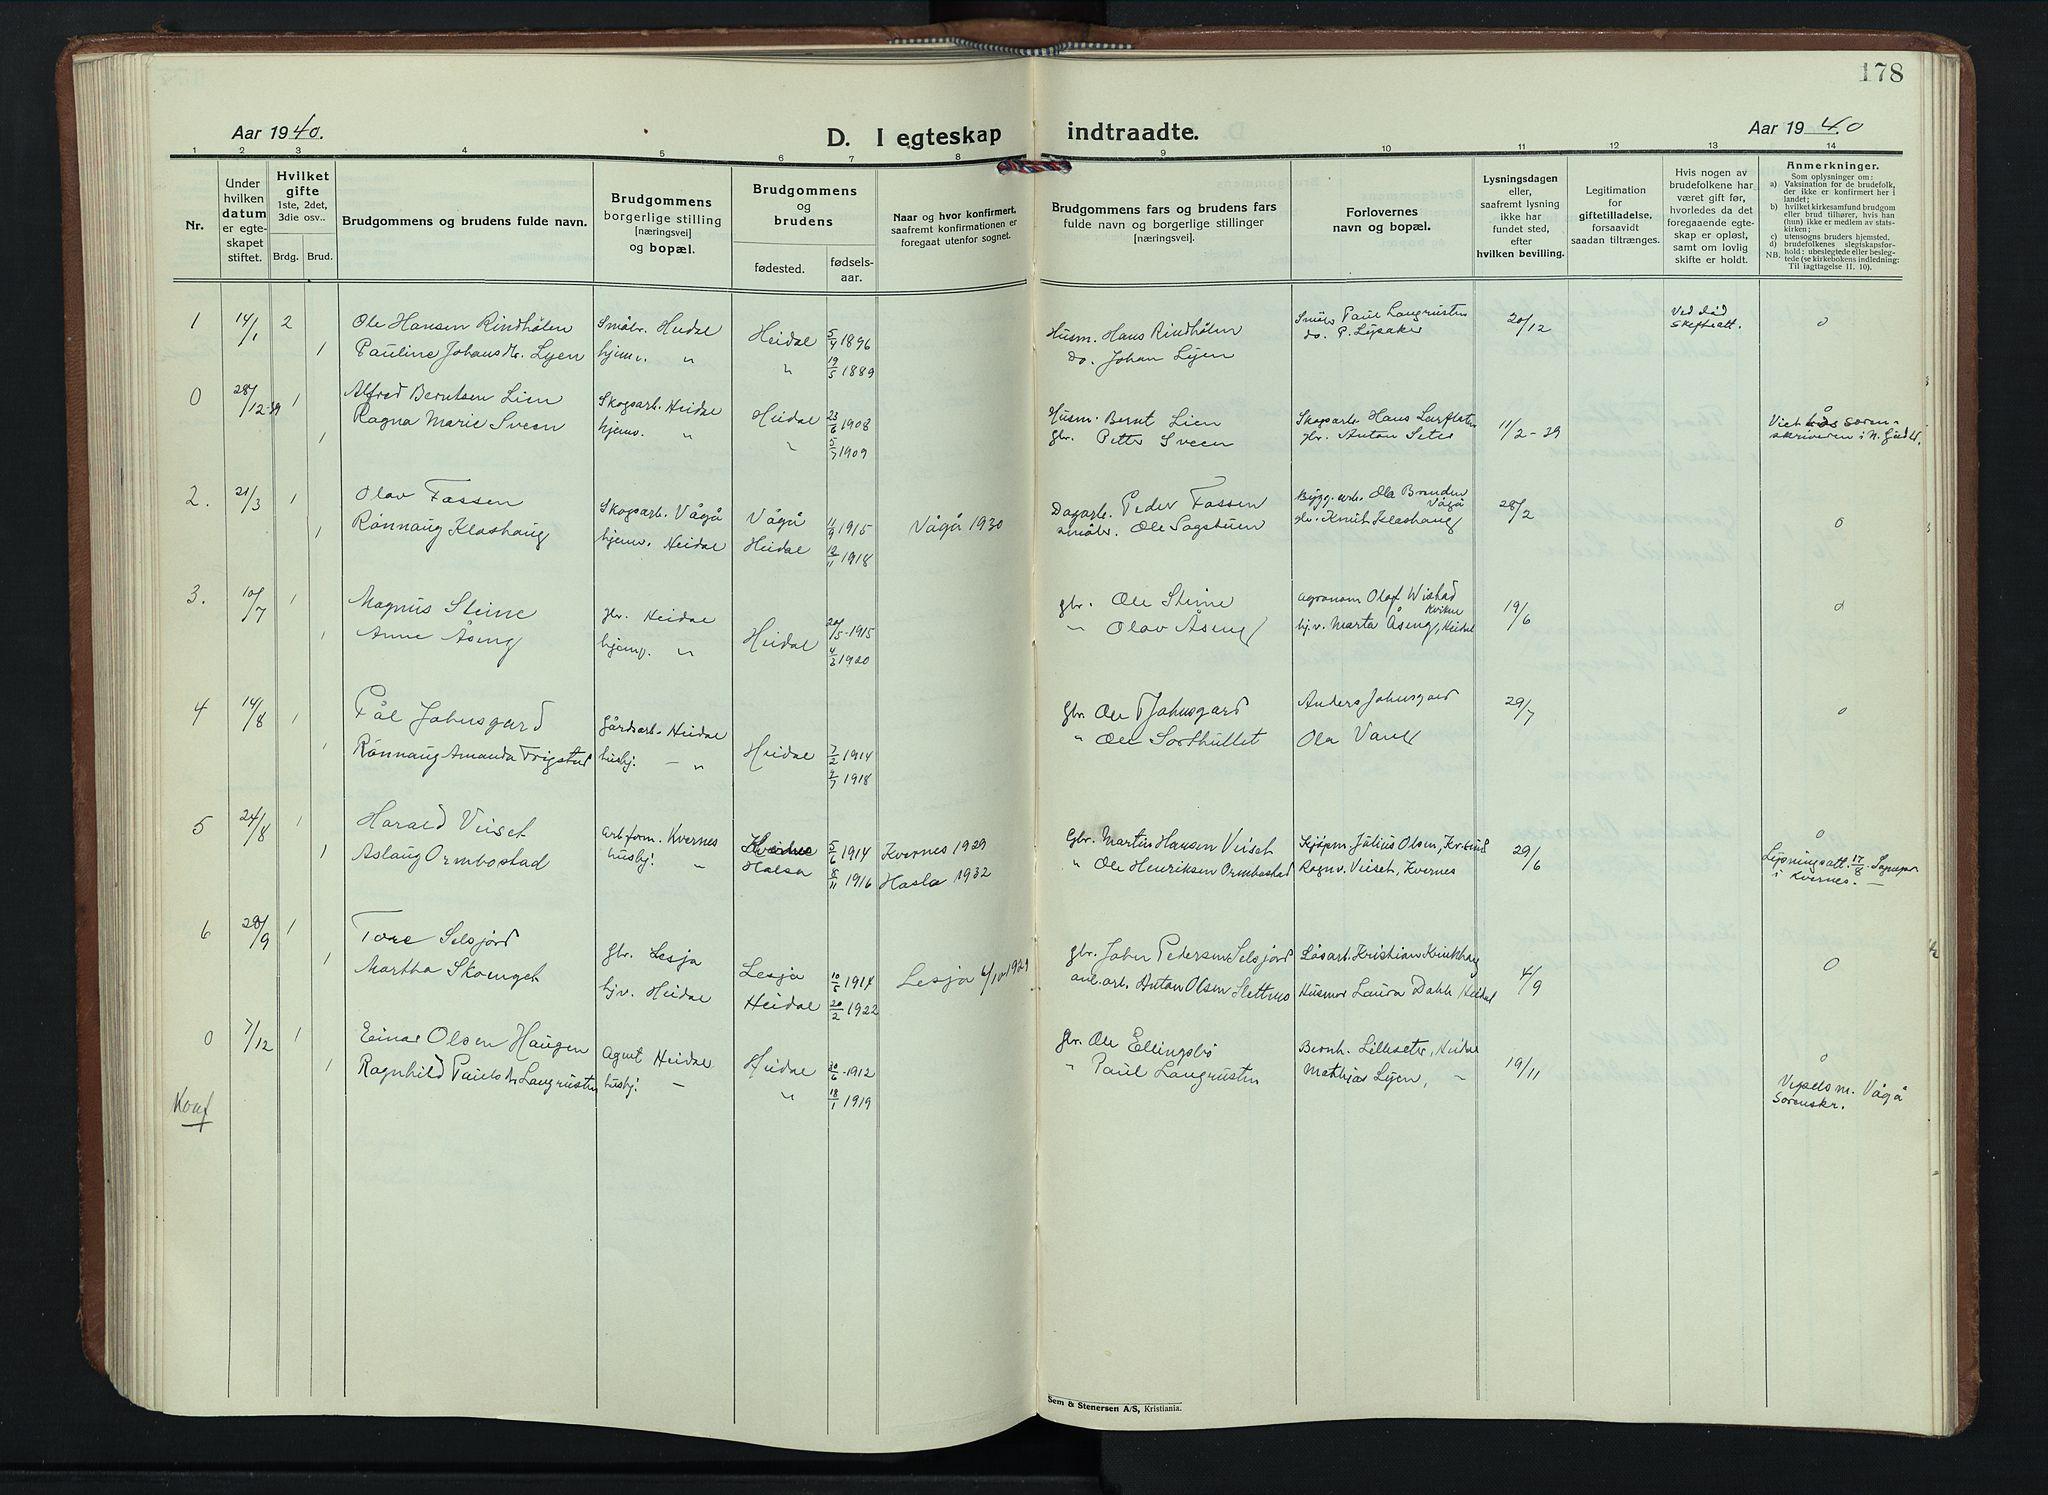 SAH, Sel prestekontor, Klokkerbok nr. 6, 1923-1953, s. 178